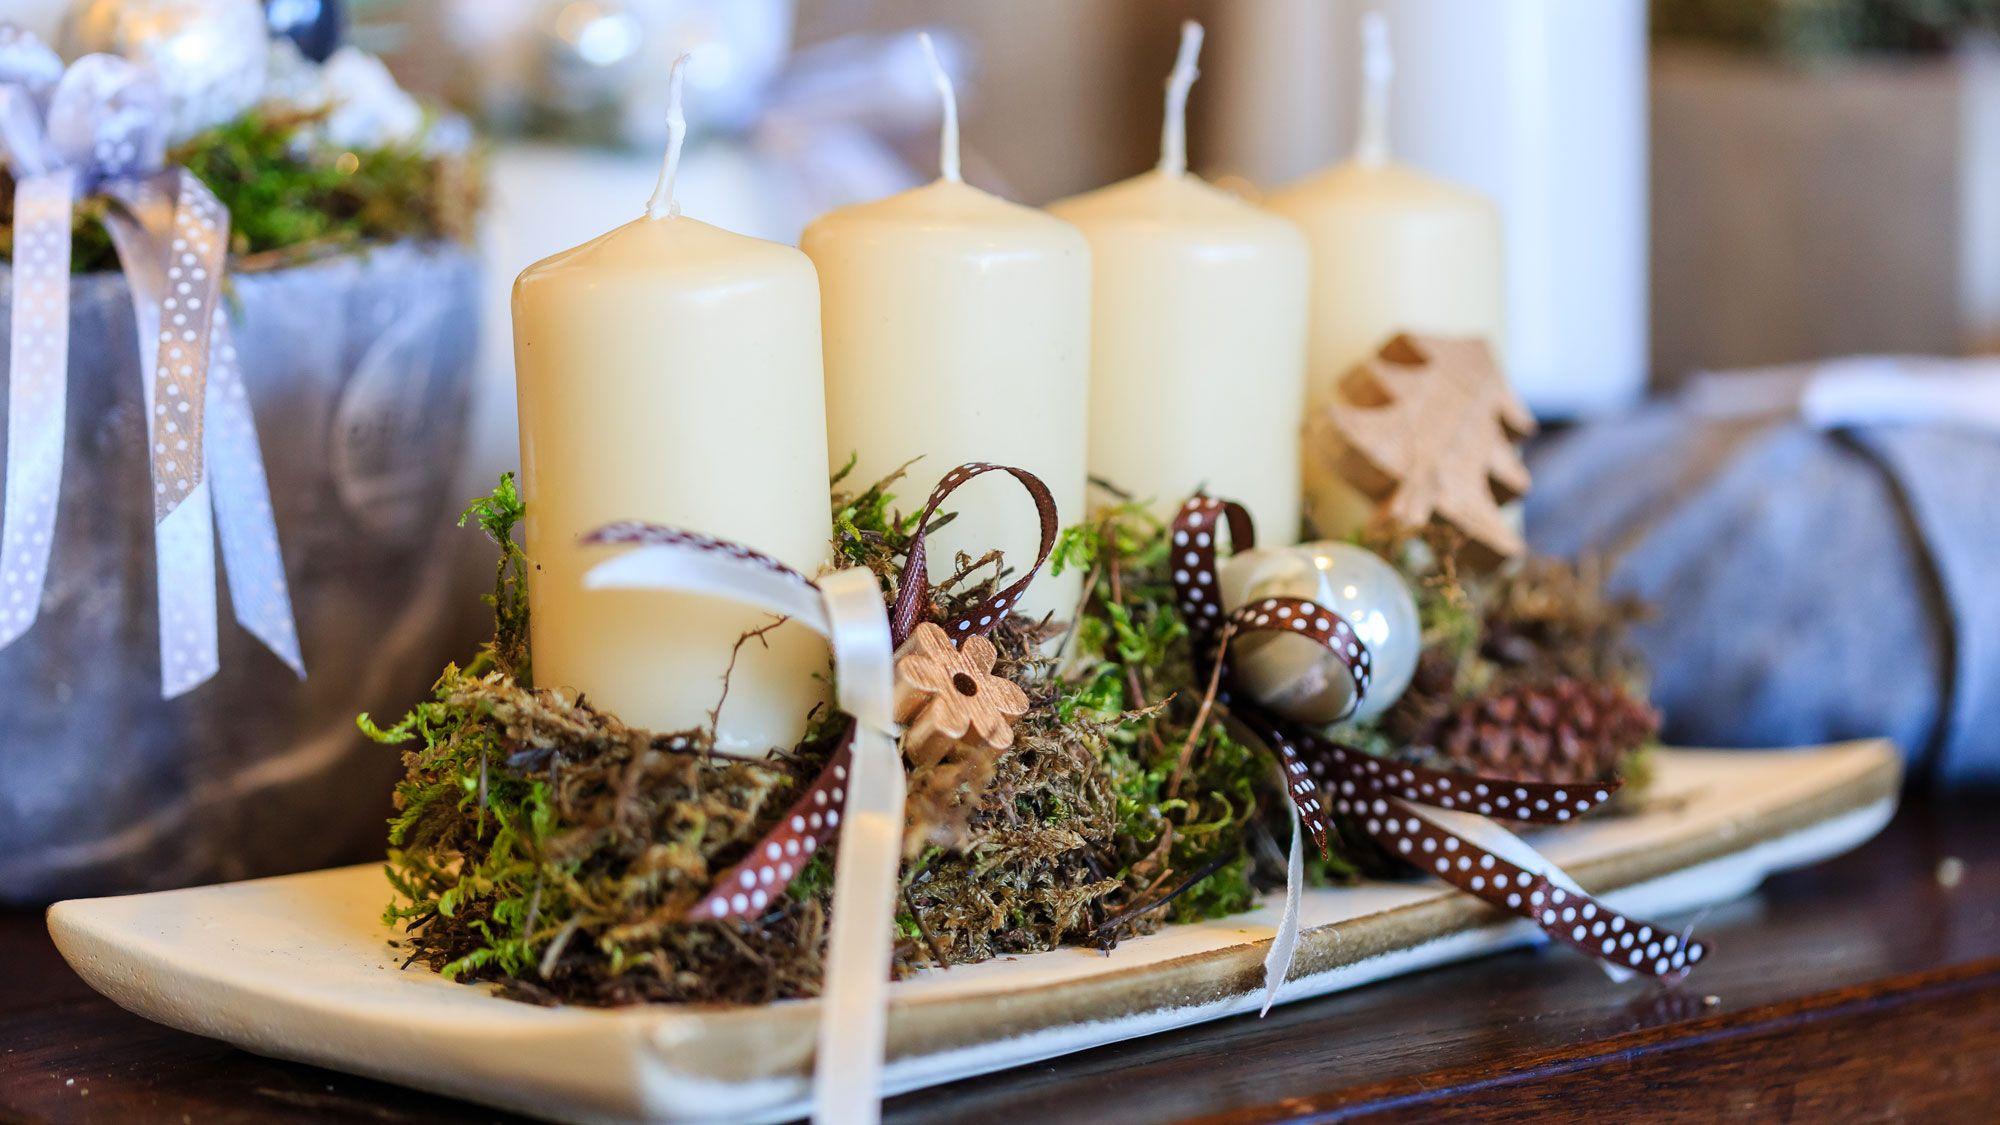 Centro navideño rústico con velas